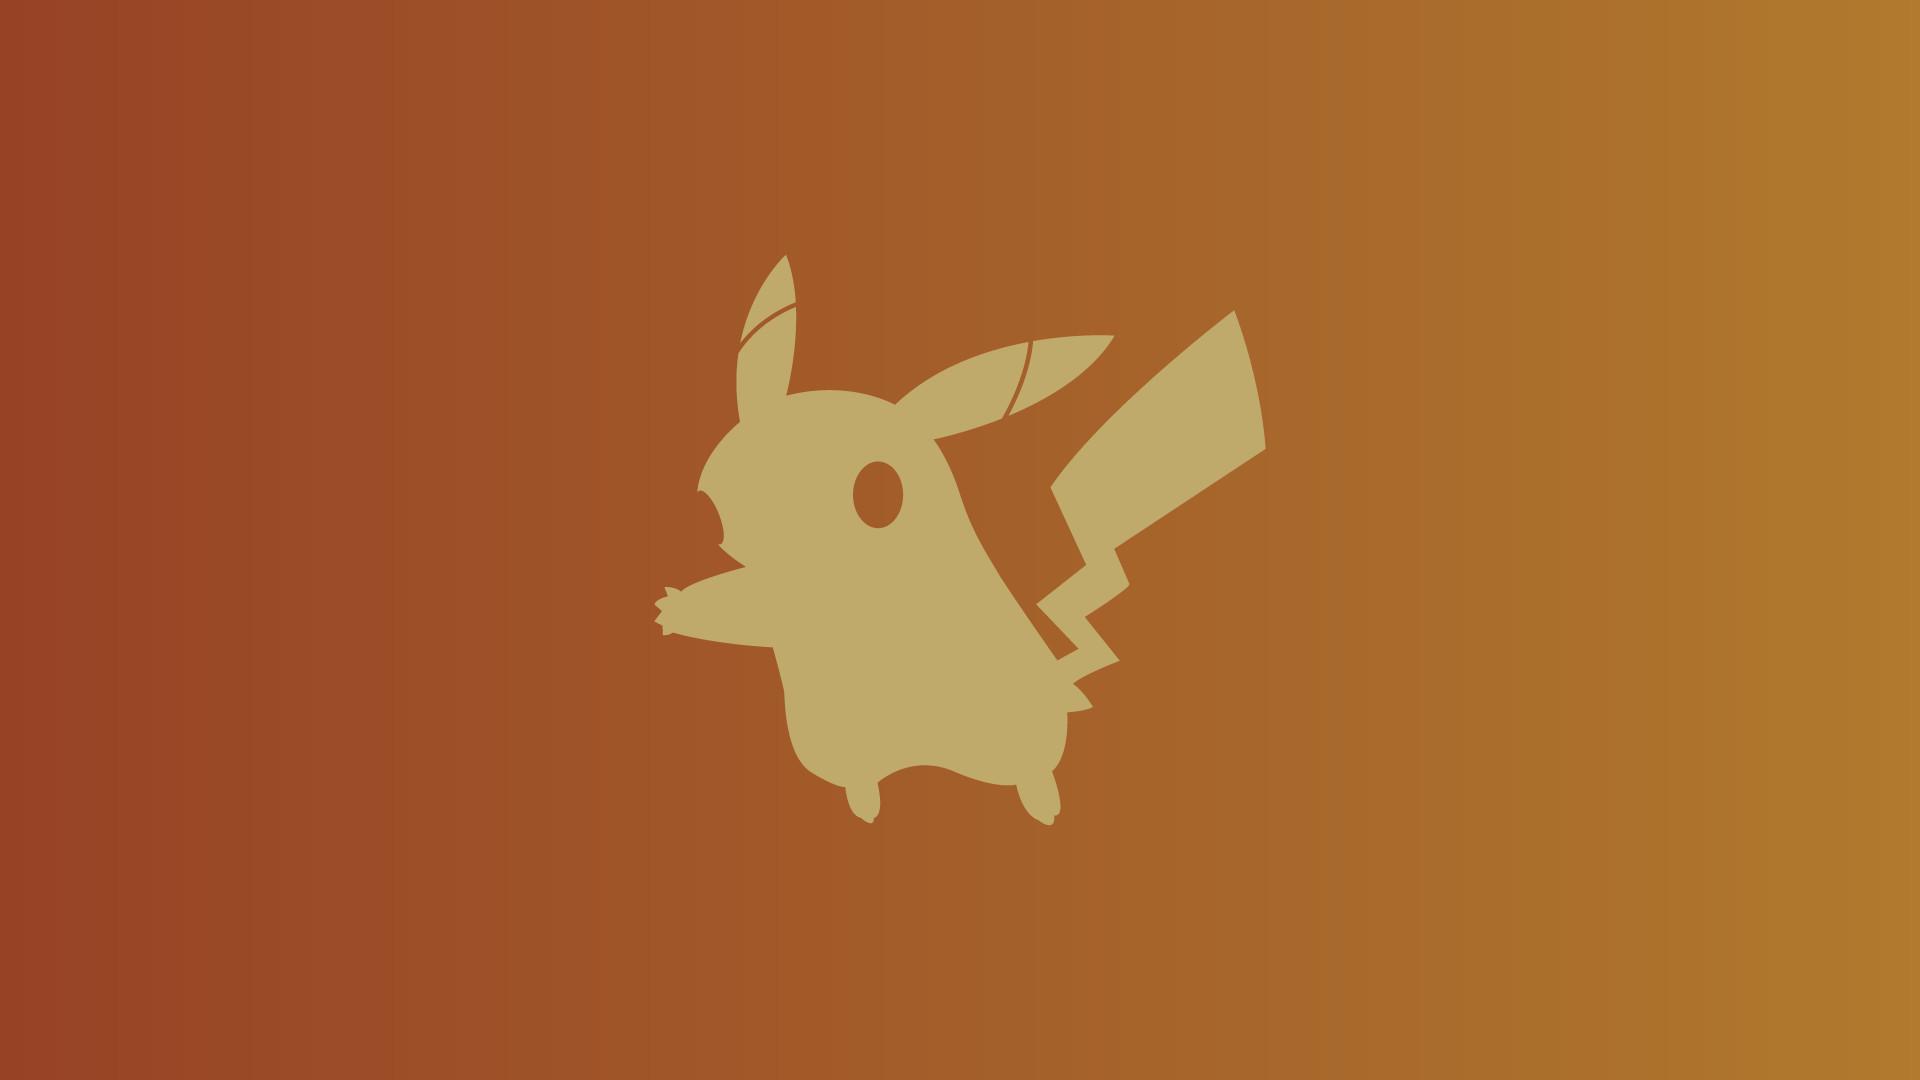 Pikachu wallpaper I made …